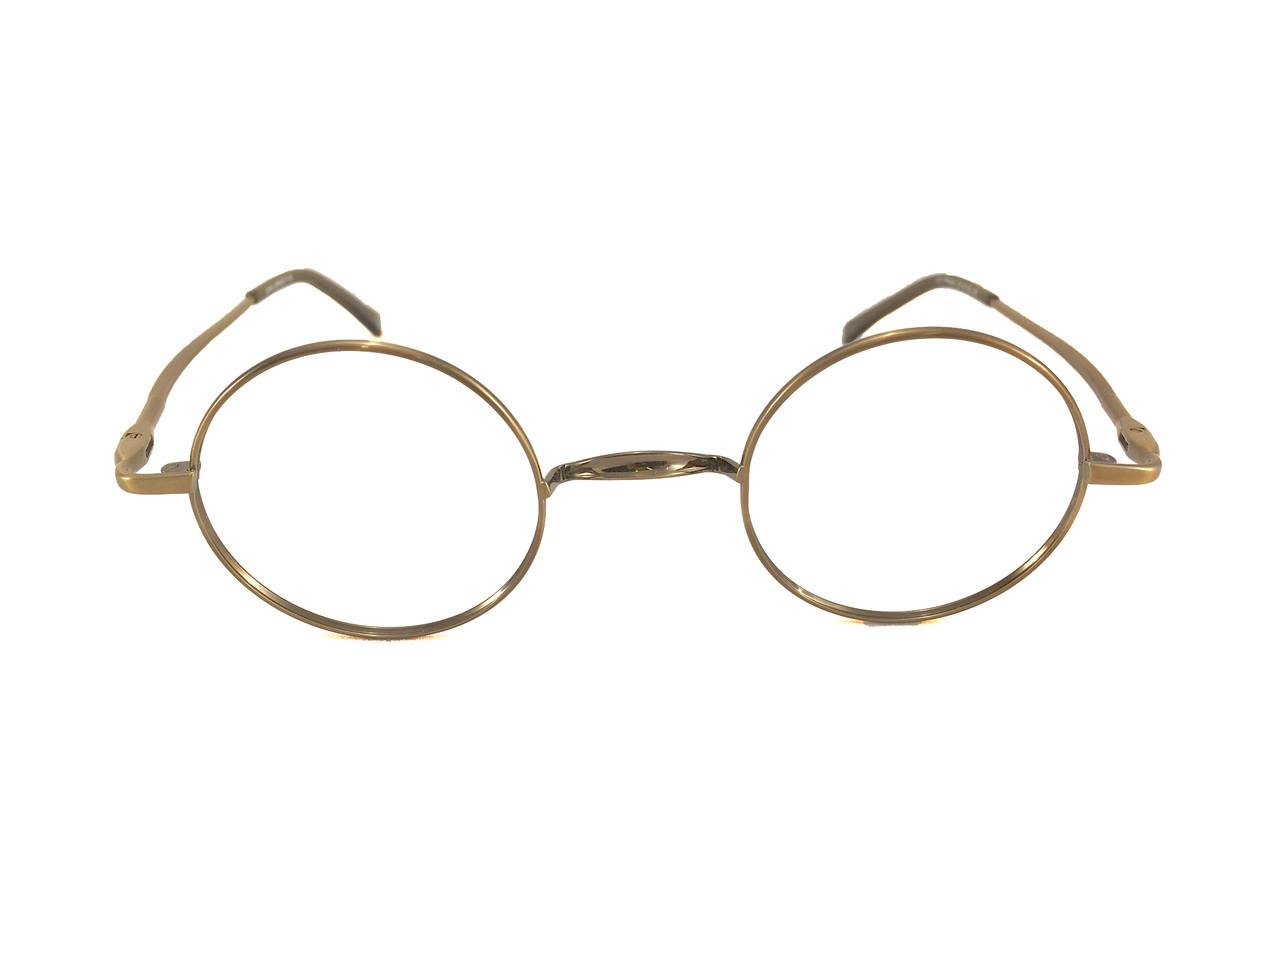 11ed6ee00f2 John Lennon Wheels Eyeglass Frames - Antique Copper